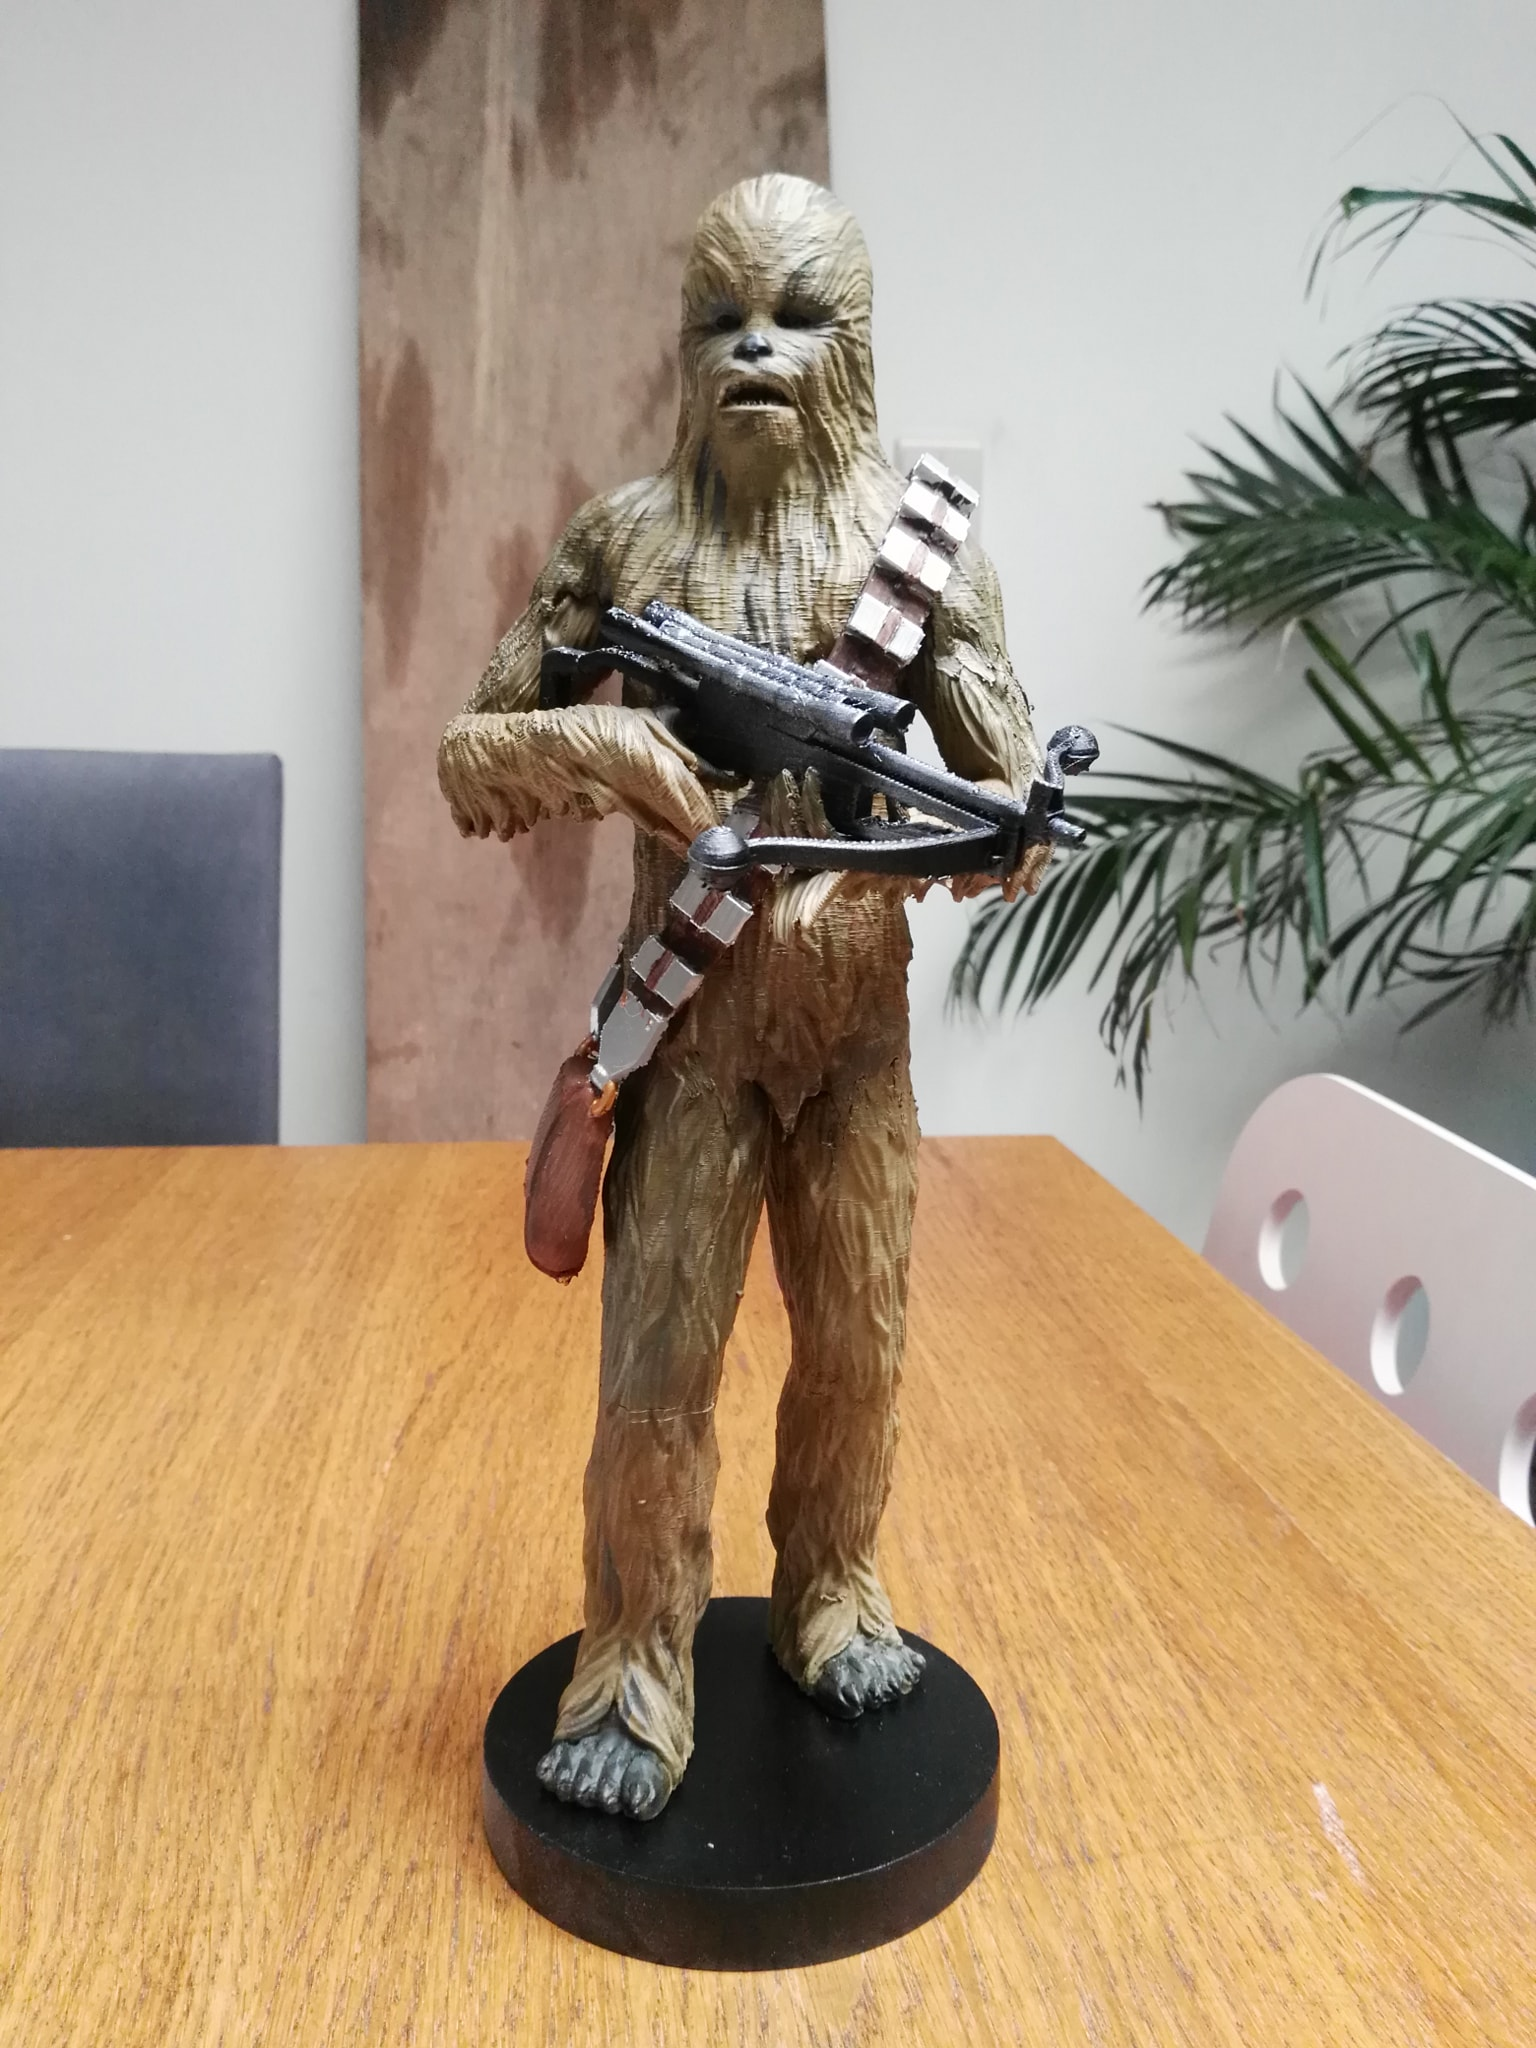 Chewbacca 3D Printing Figurine Photo 3